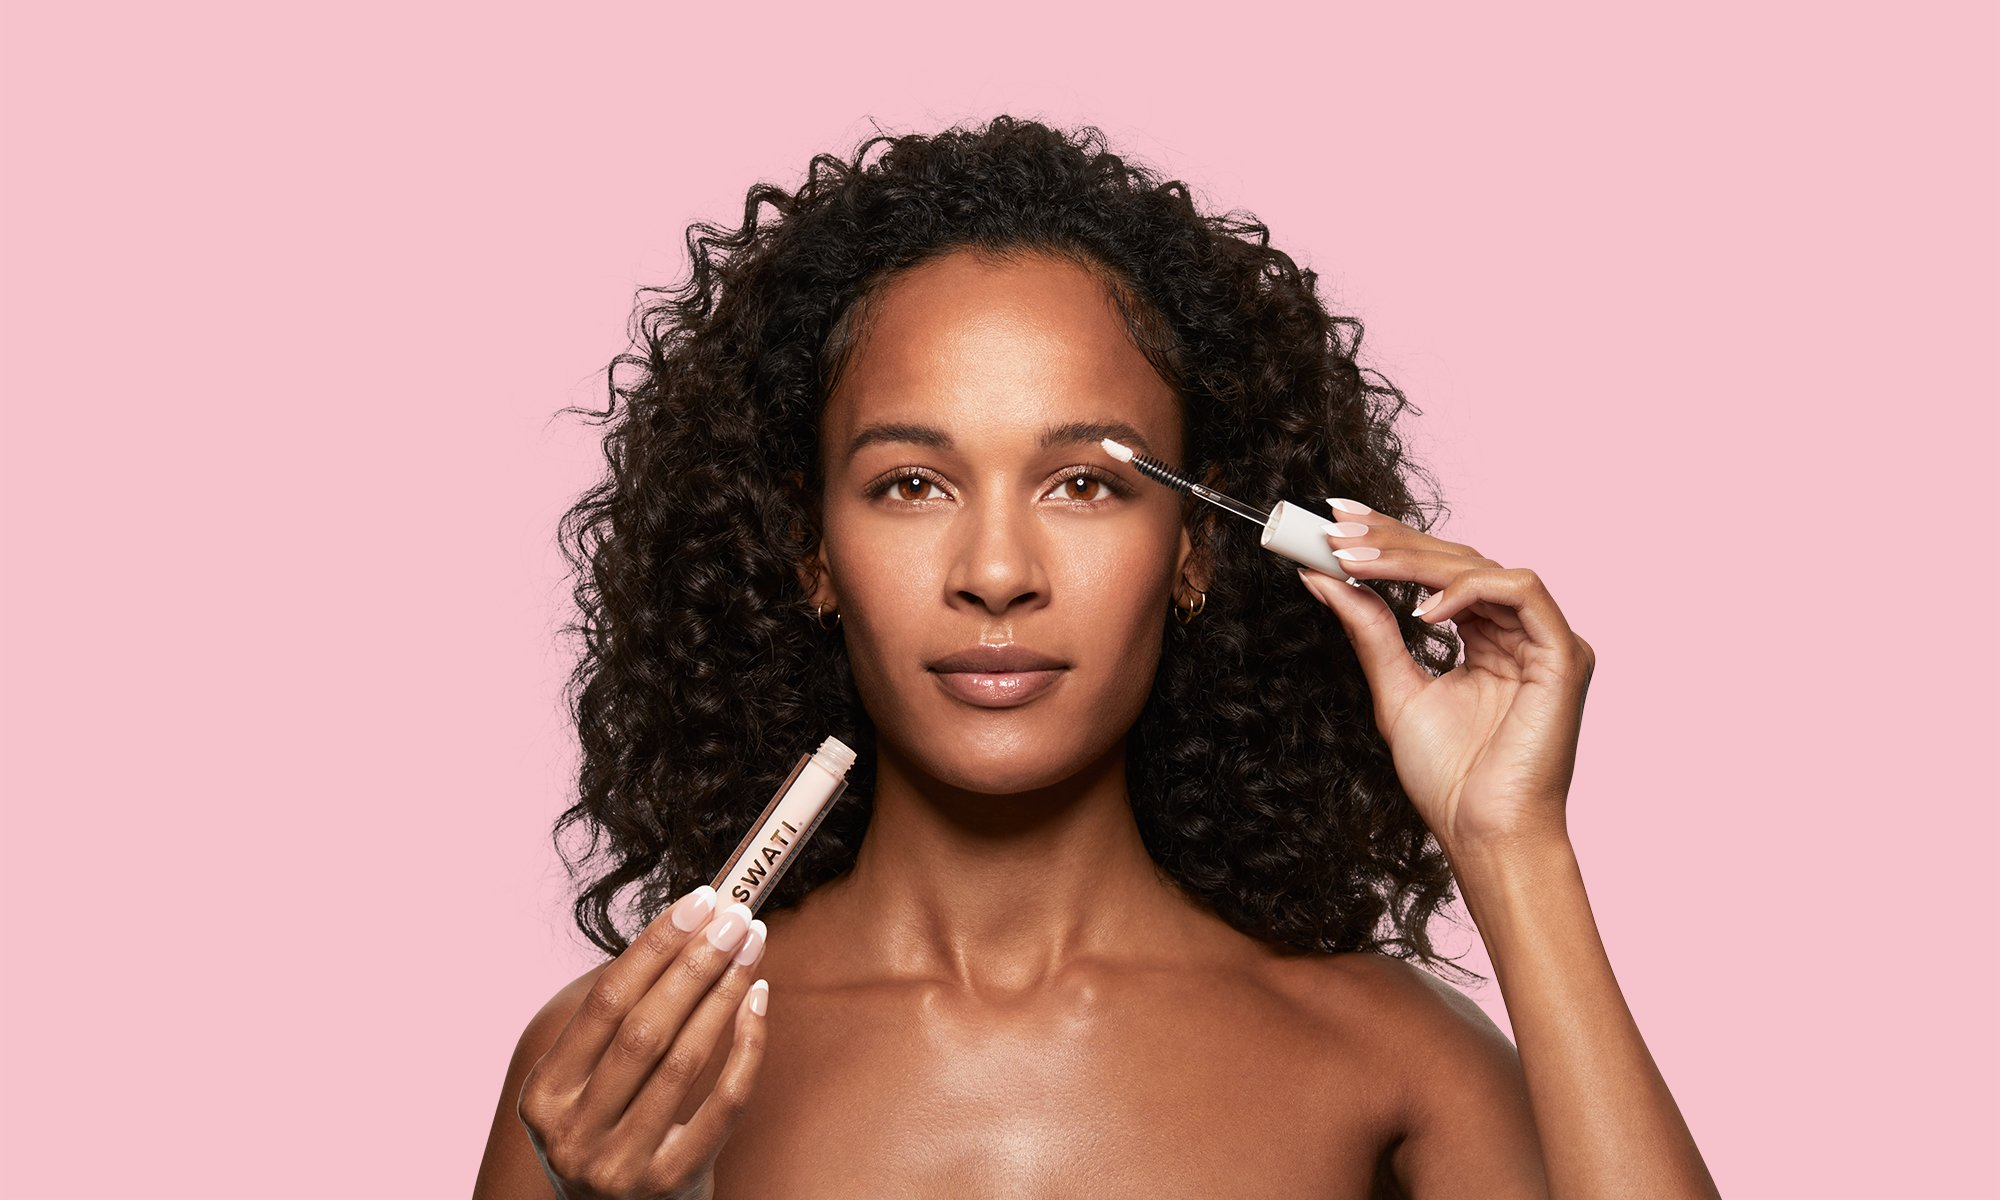 SWATI Tourmaline - Lash & brow boosting serum on tanned skin model